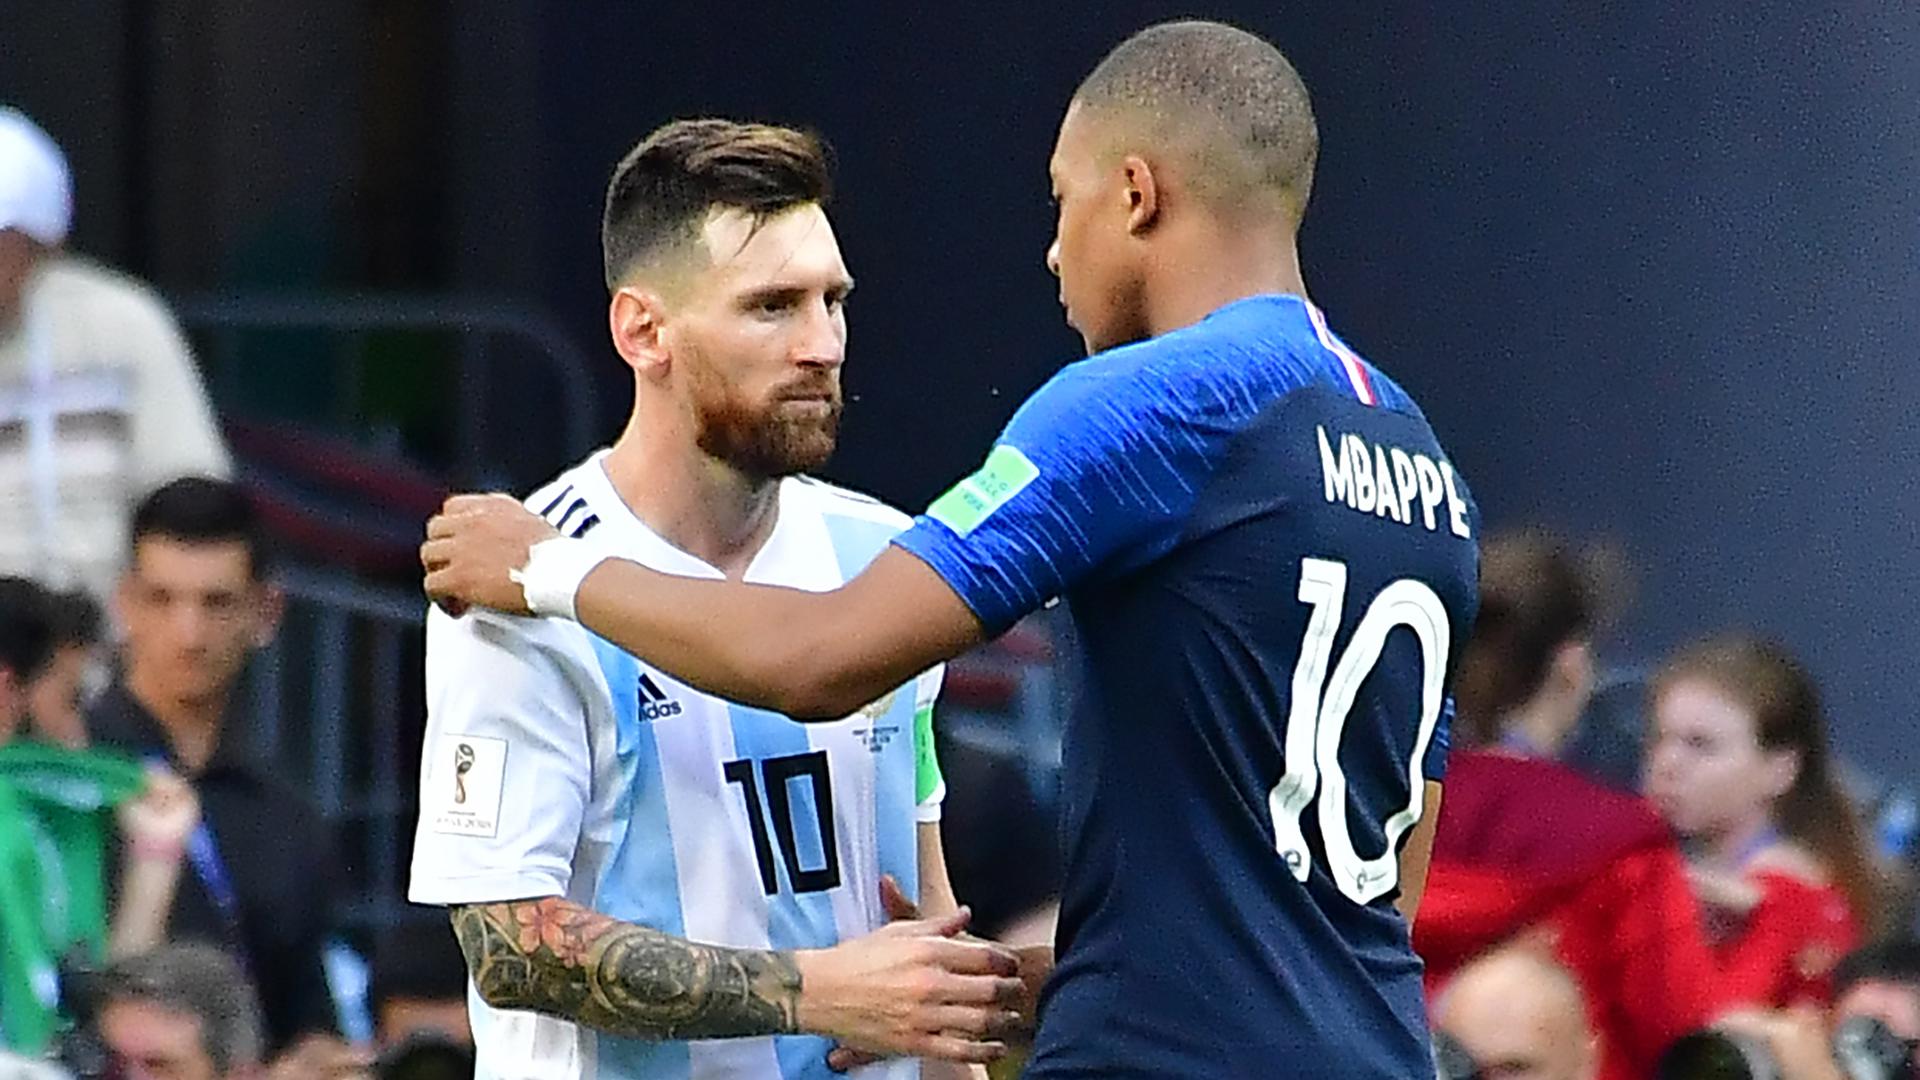 5ade1f7aca6e Lionel Messi news: Lyon defender Marcelo says Kylian Mbappe more ...